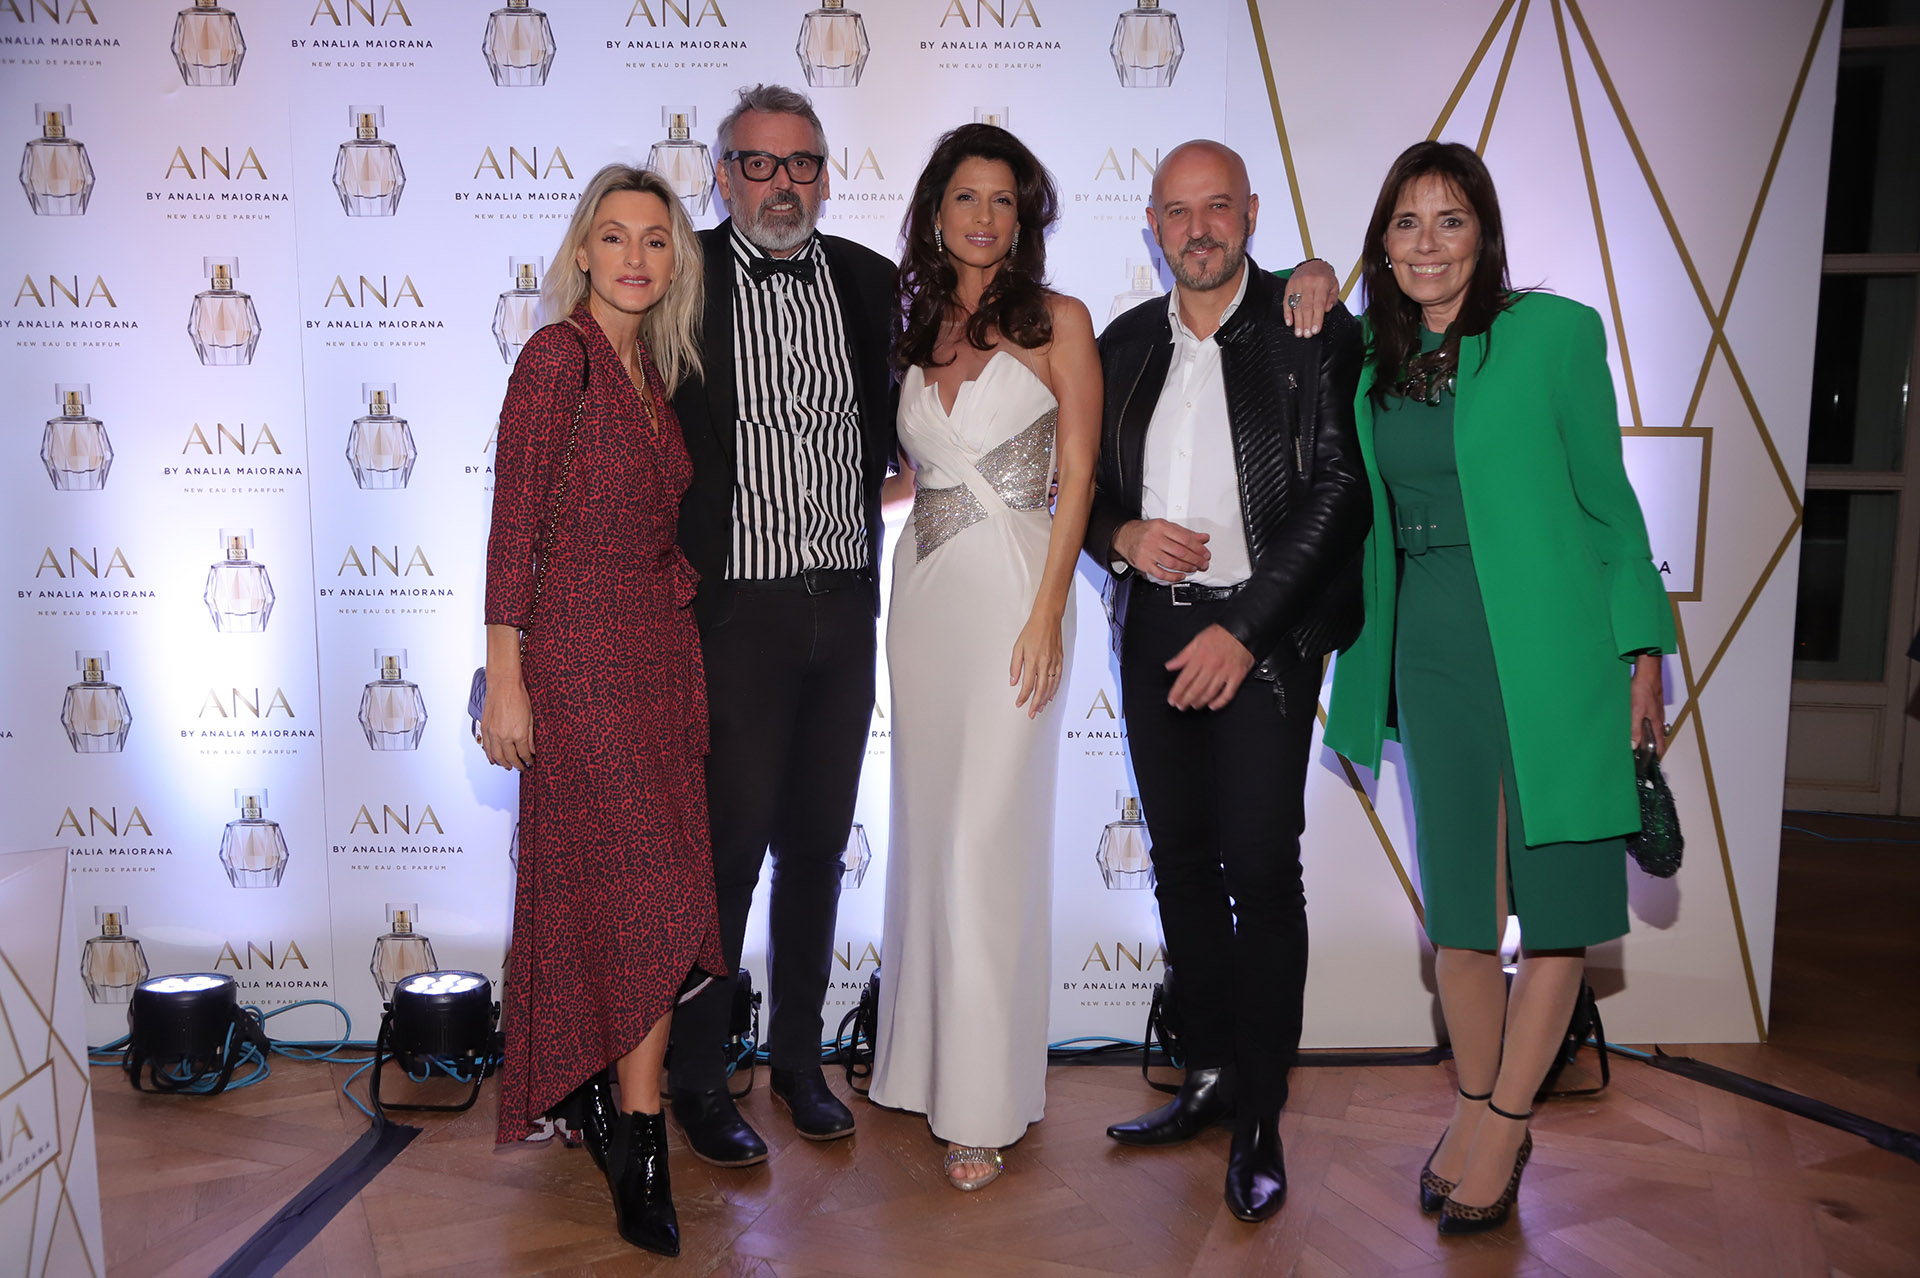 Cynthia Kern, Benito Fernández, Analía Maiorana, Fabián Zitta y Claudia Pandolfo